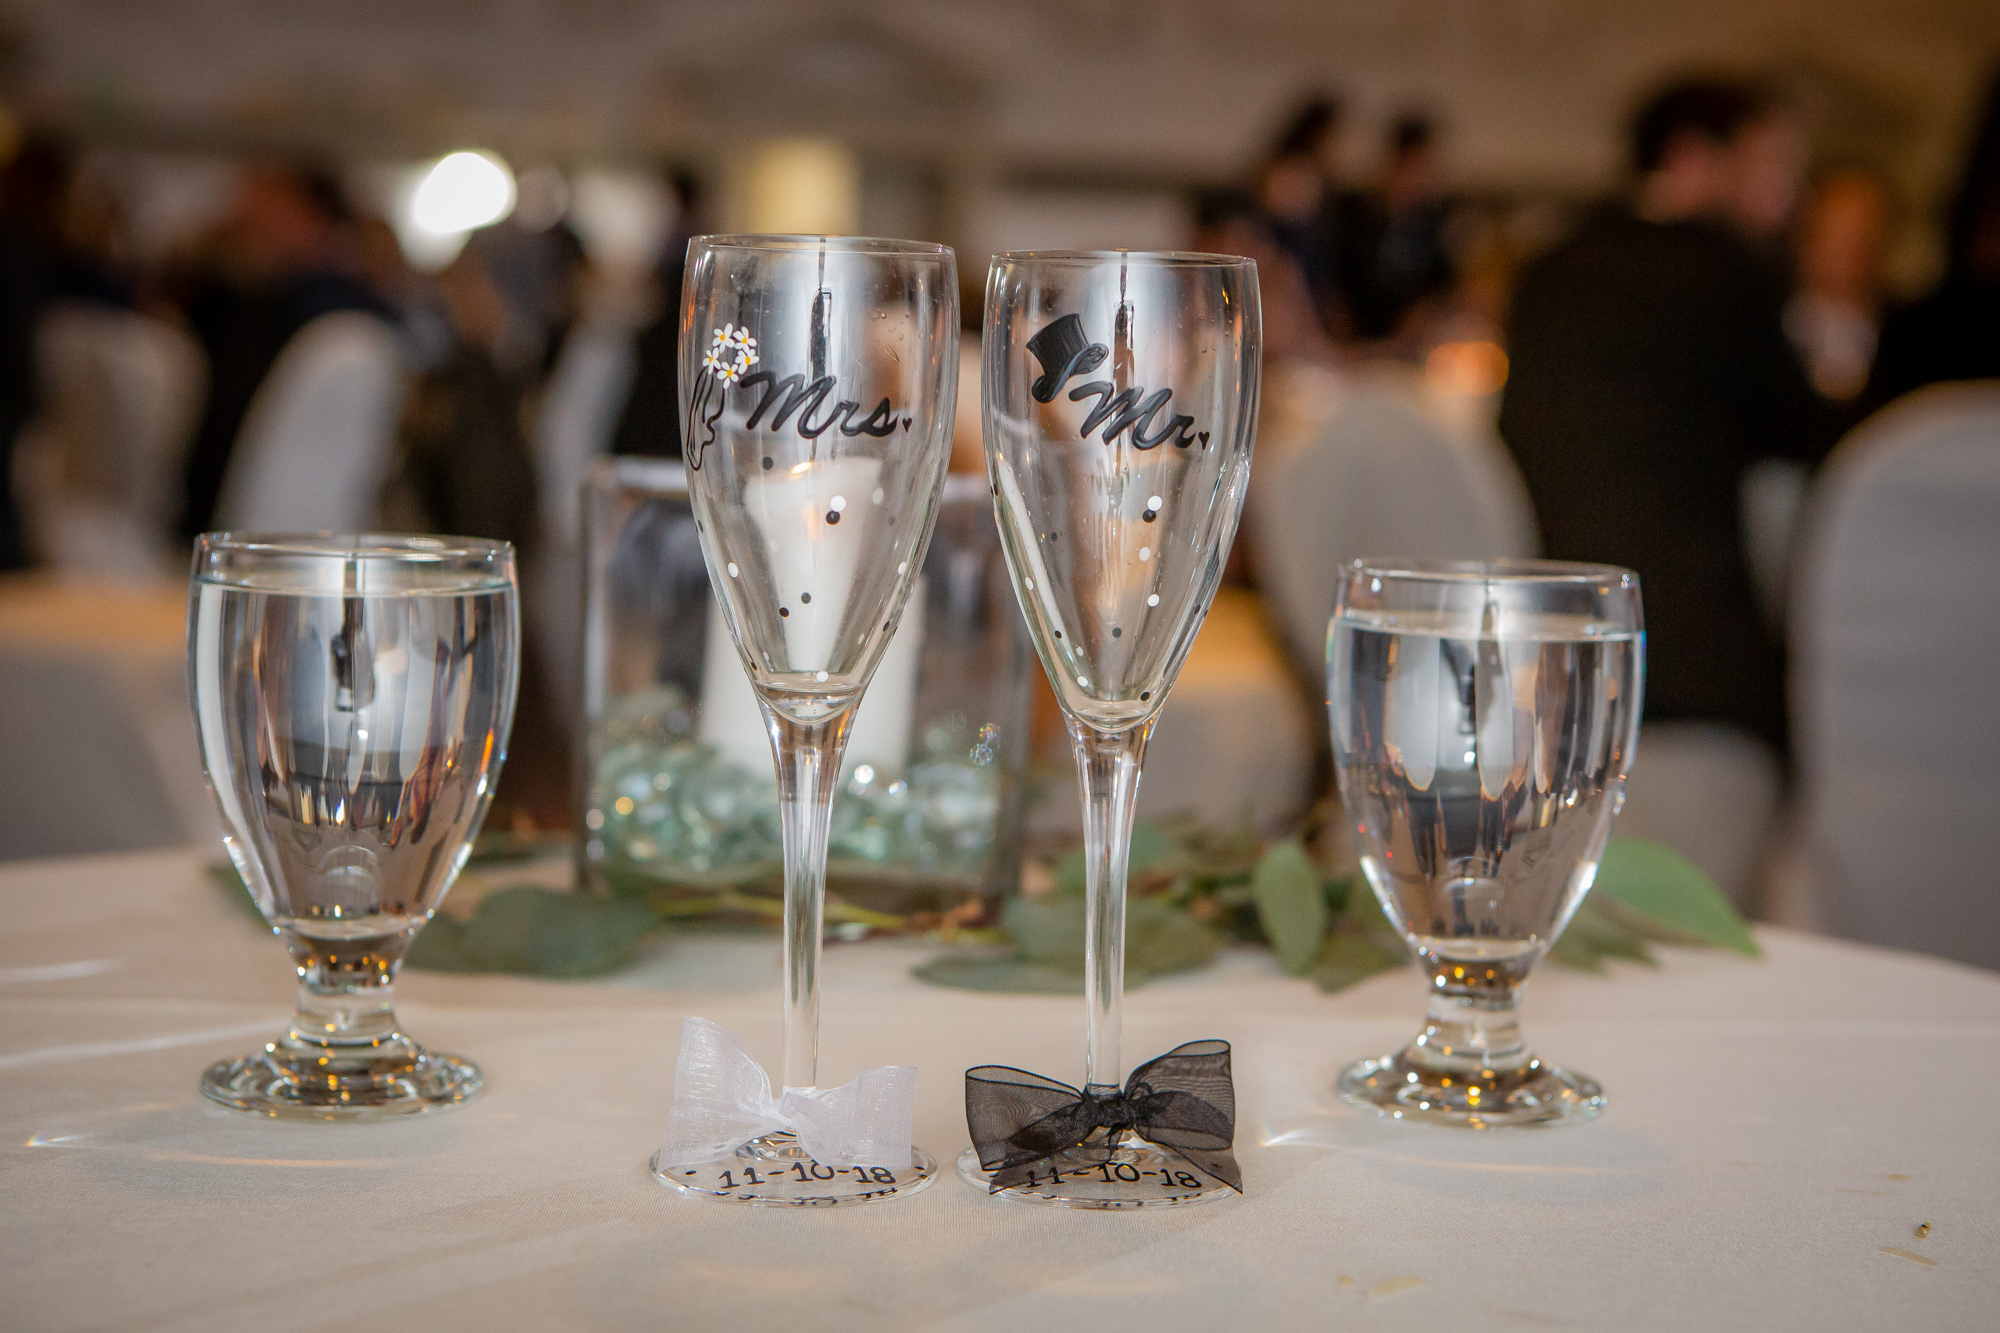 Harro-East-Theatre-and-Ballroom-wedding-8037.jpg